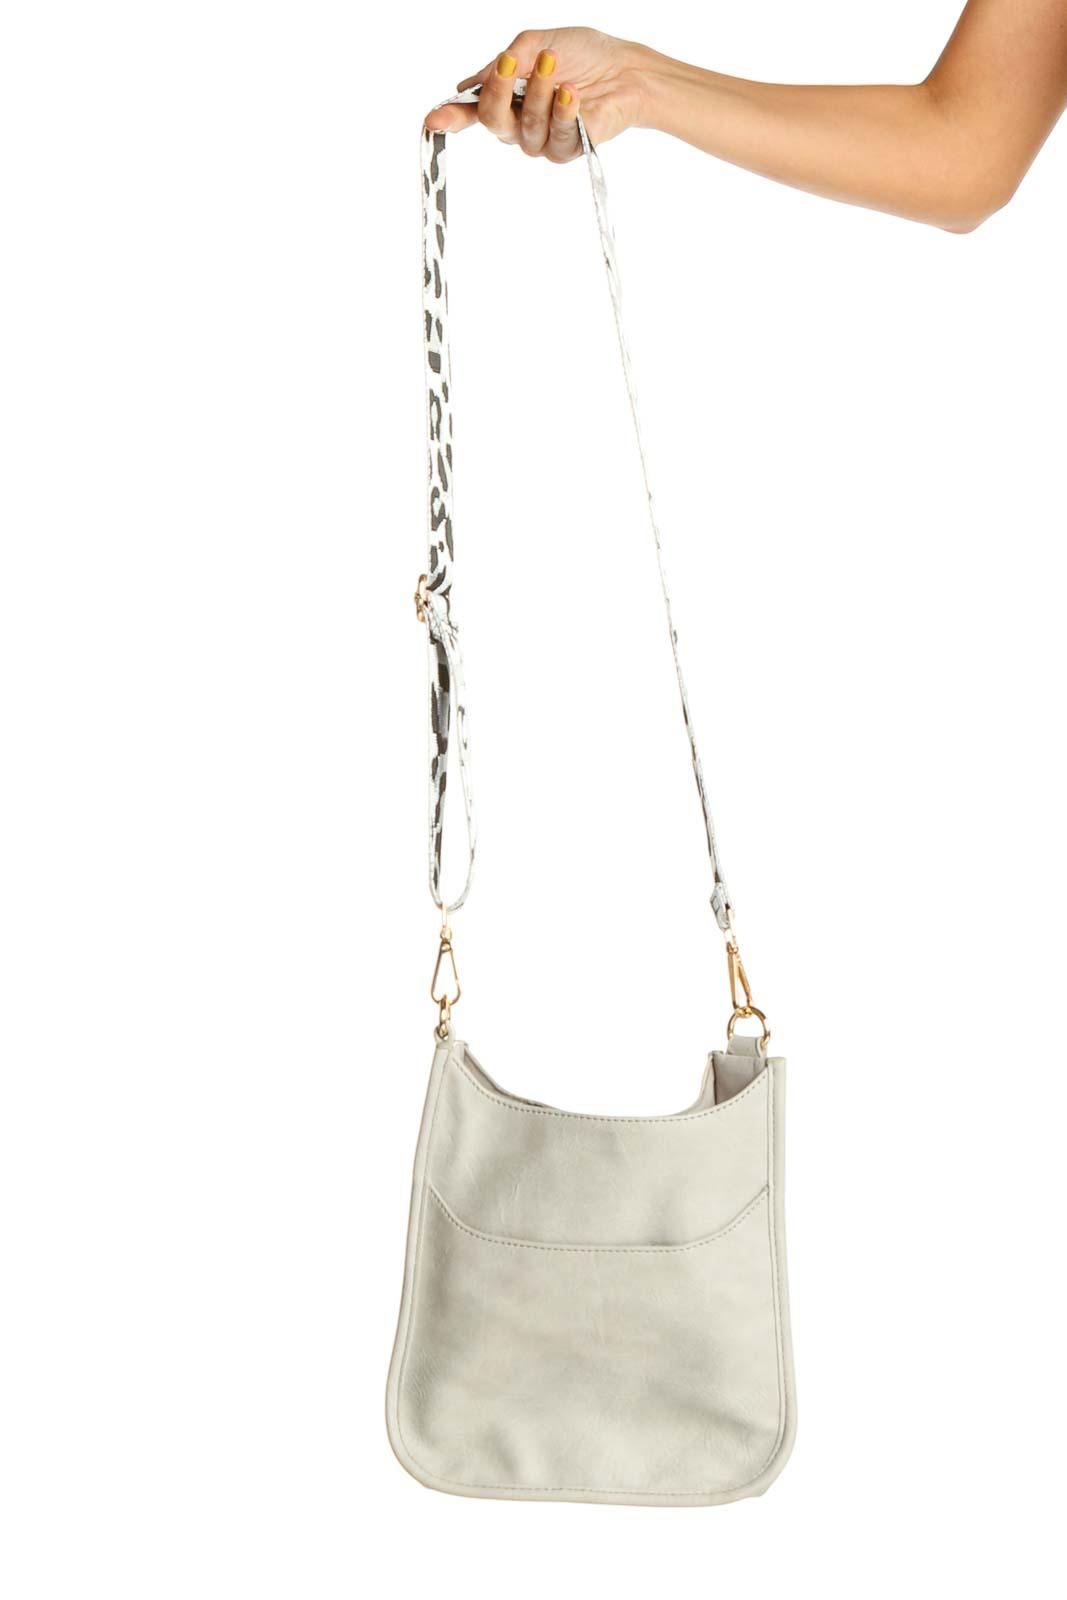 Gray Shoulder Bag with Animal Print Strap Front